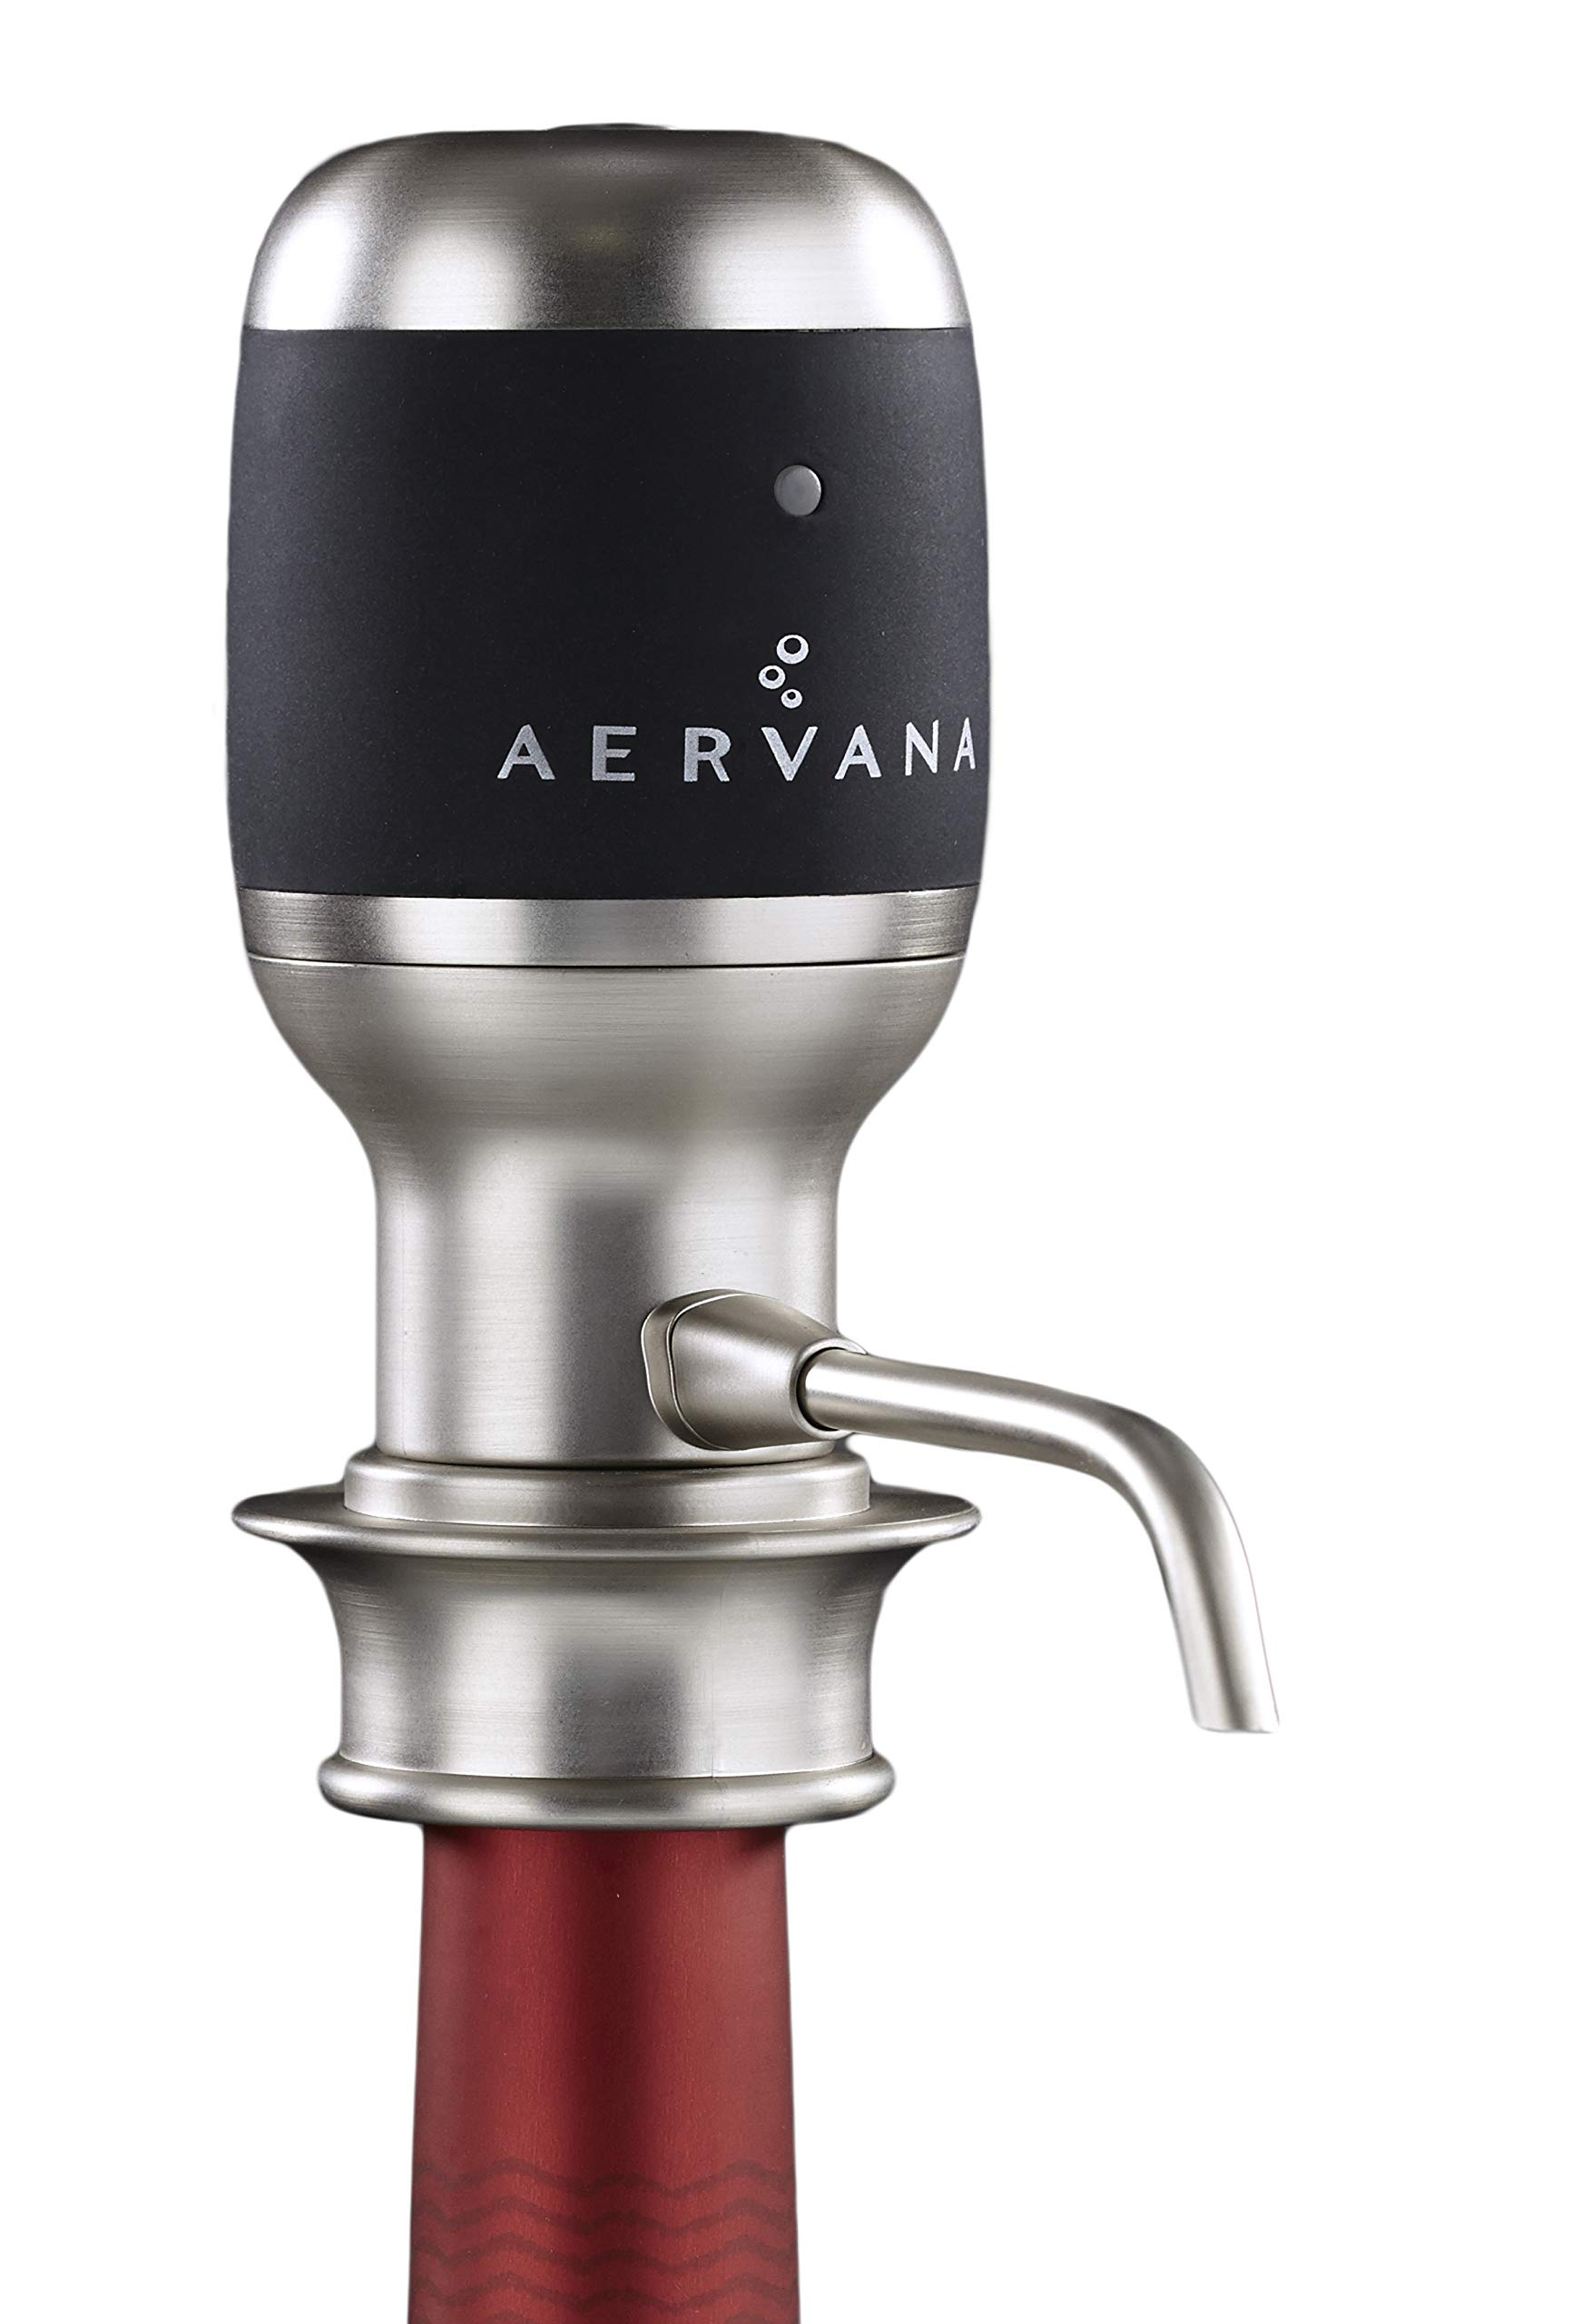 Aervana Original: One-Touch Luxury Wine Aerator